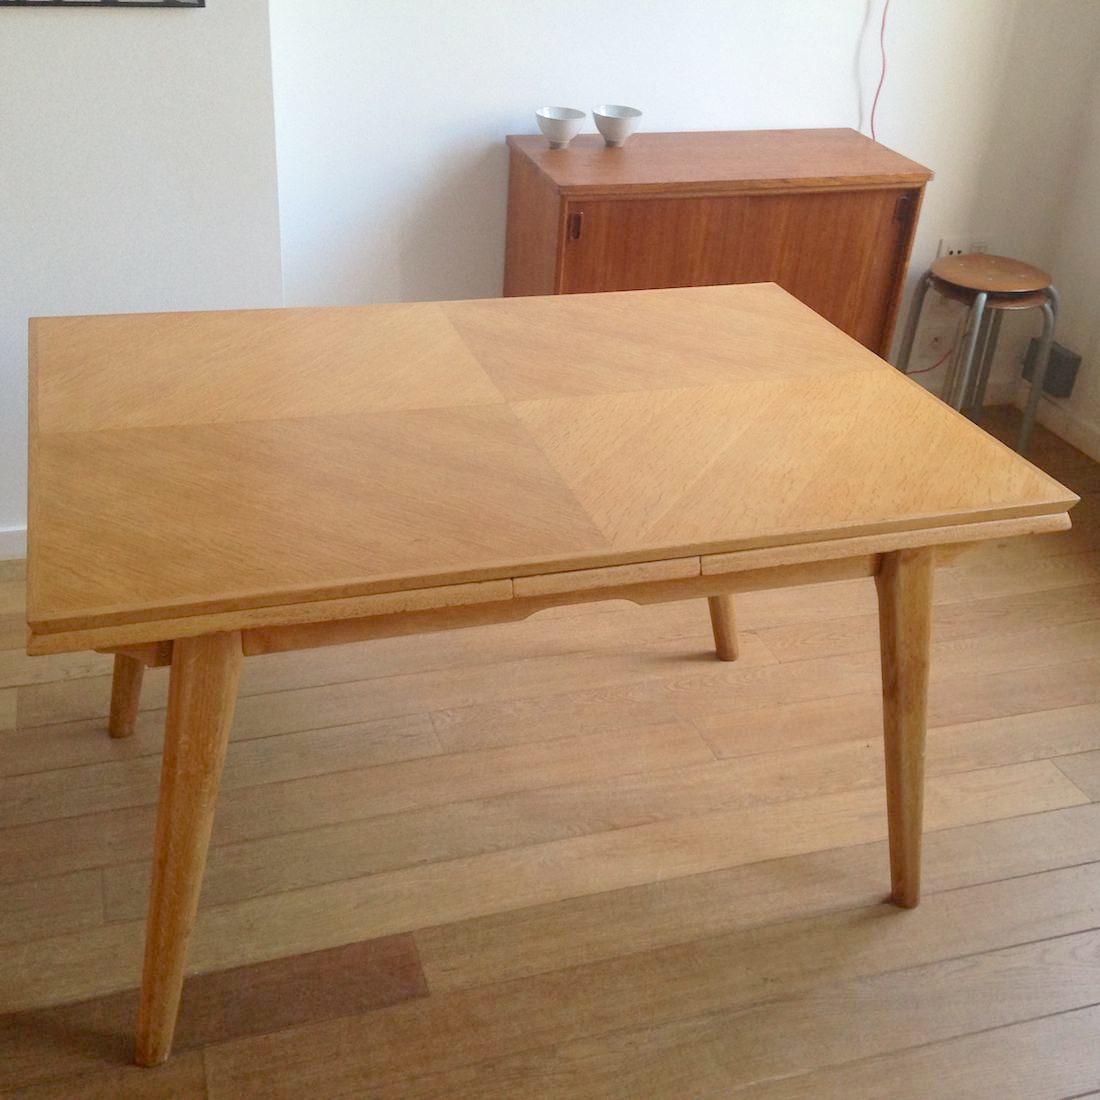 pieds de table design maison design. Black Bedroom Furniture Sets. Home Design Ideas